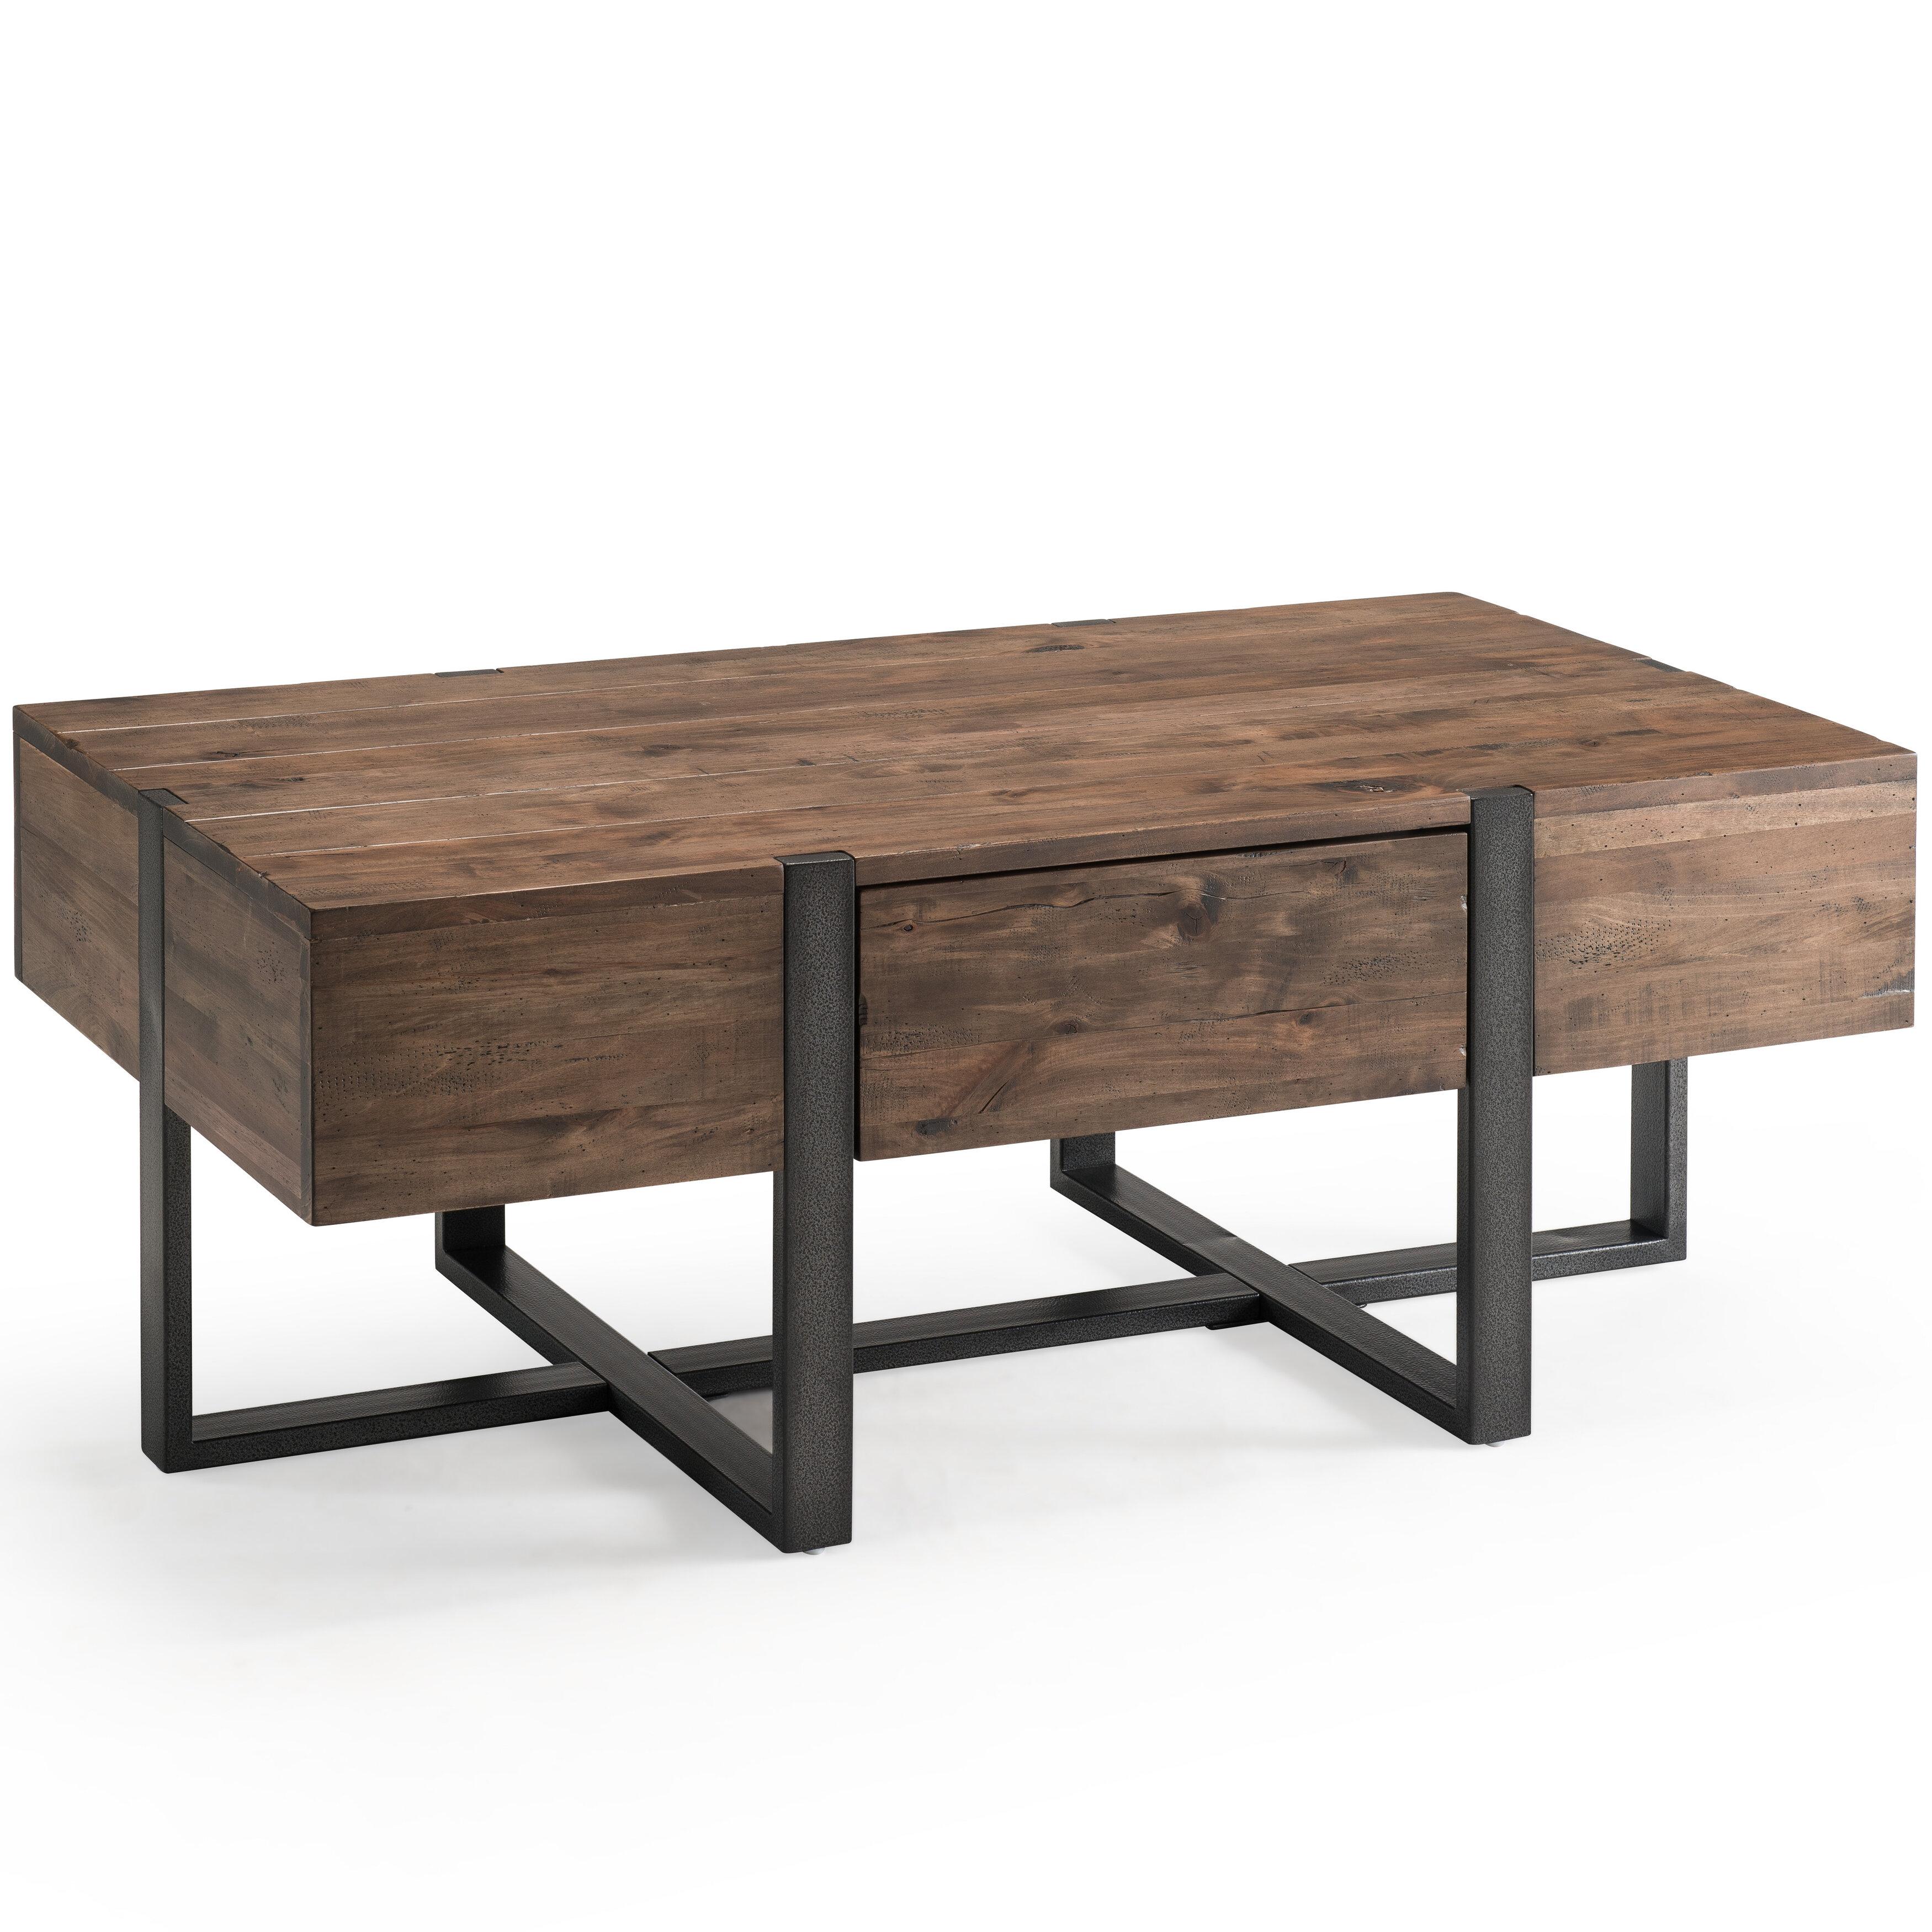 Clarkston Cross Legs Coffee Table Reviews Joss Main